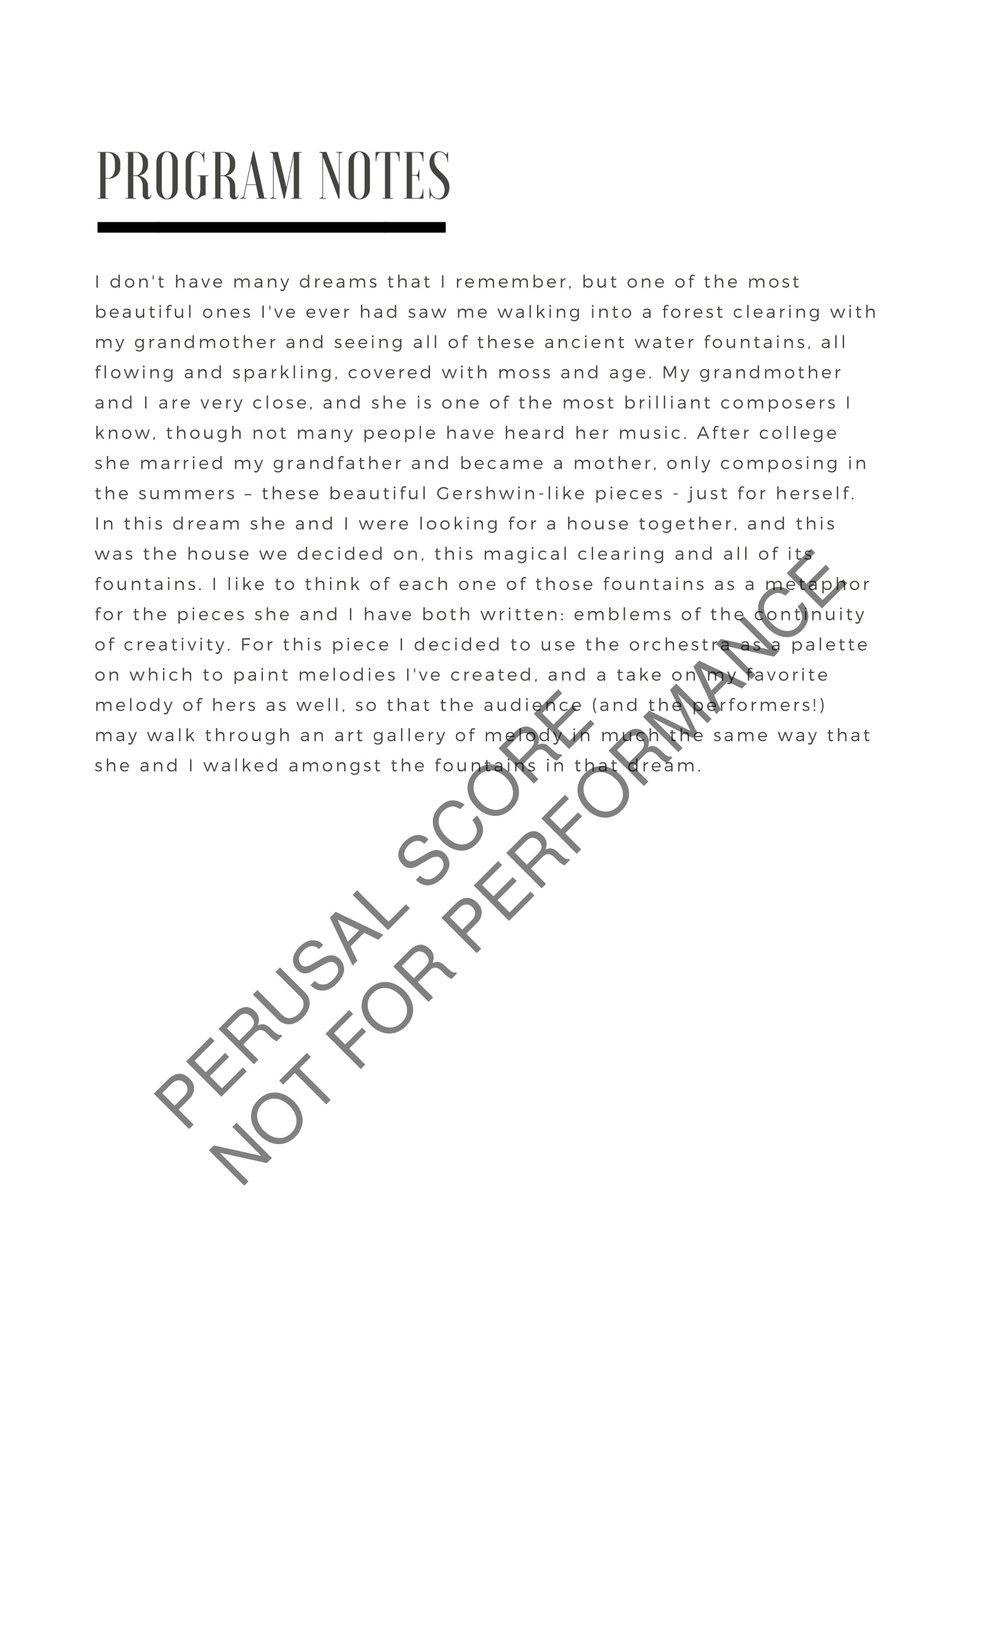 Boyd HouseofFountains Score-watermark-04.jpg